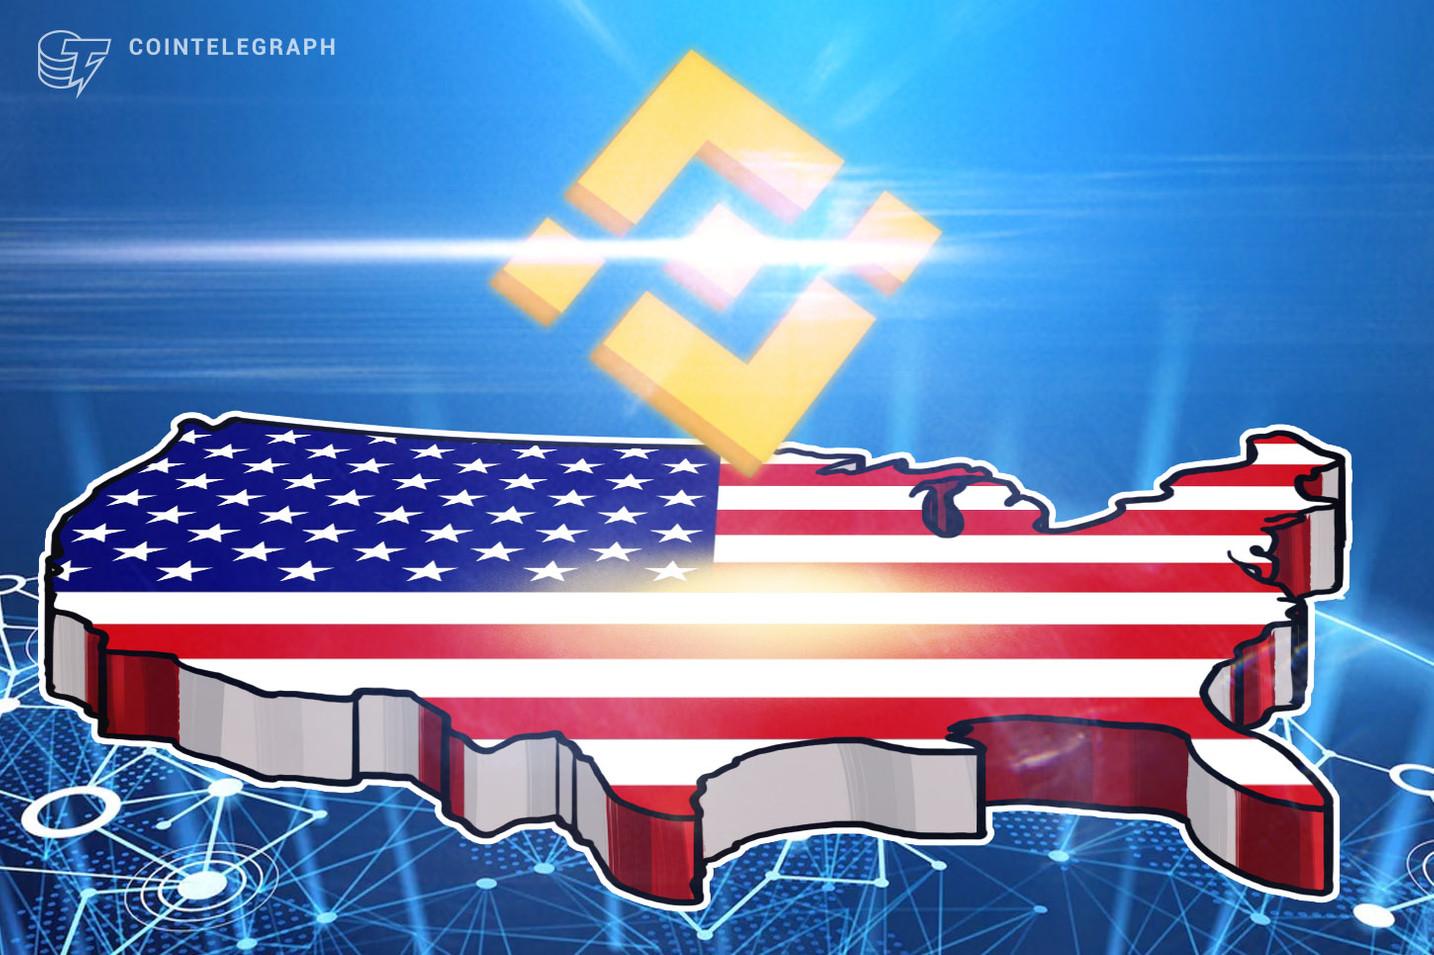 Binance.US ahora proporciona liquidez institucional a la firma de corretaje de criptomonedas Tagomi